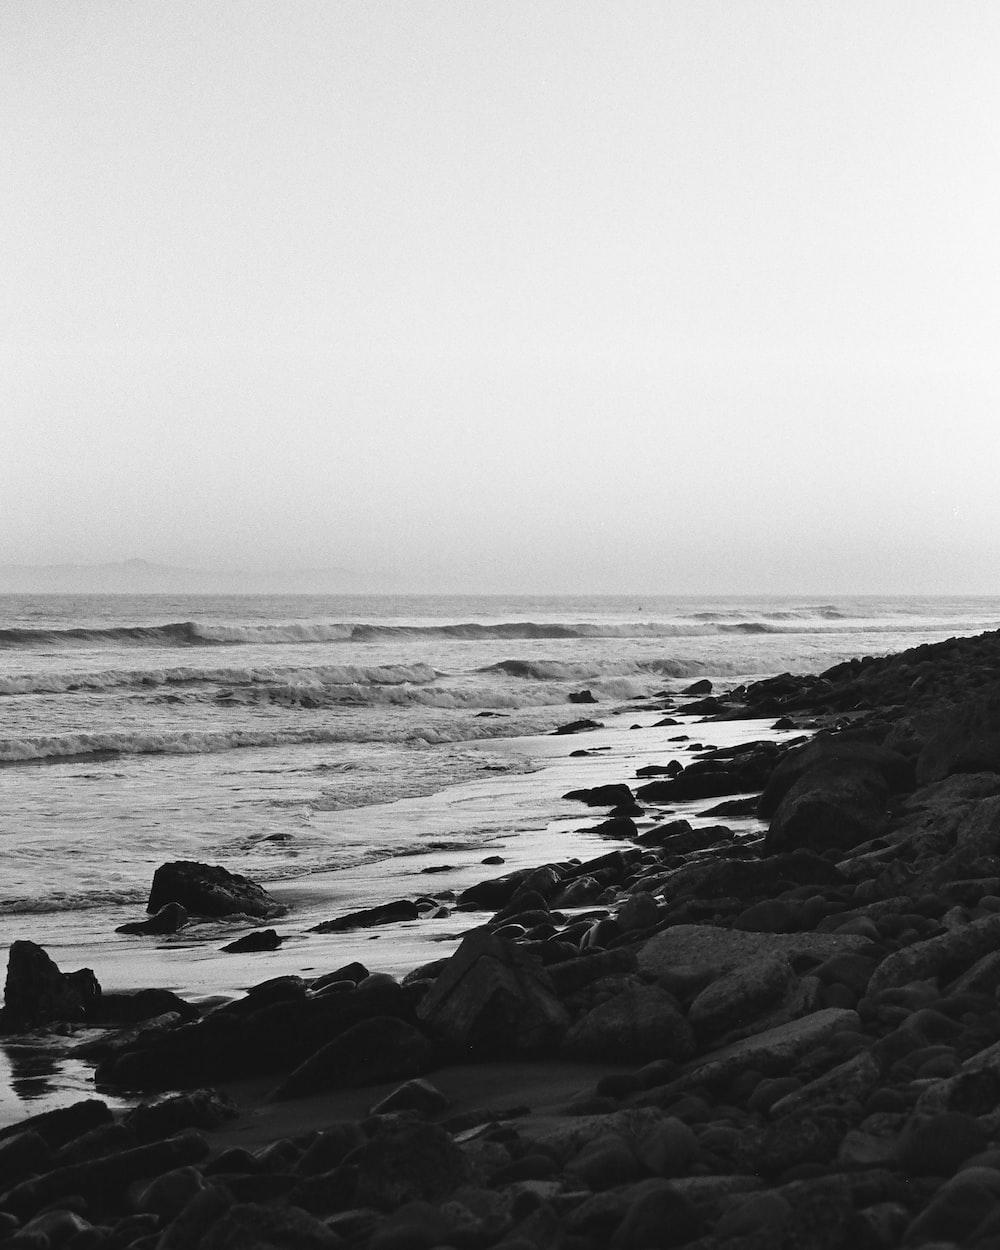 grayscale photo of sea waves crashing on rocks